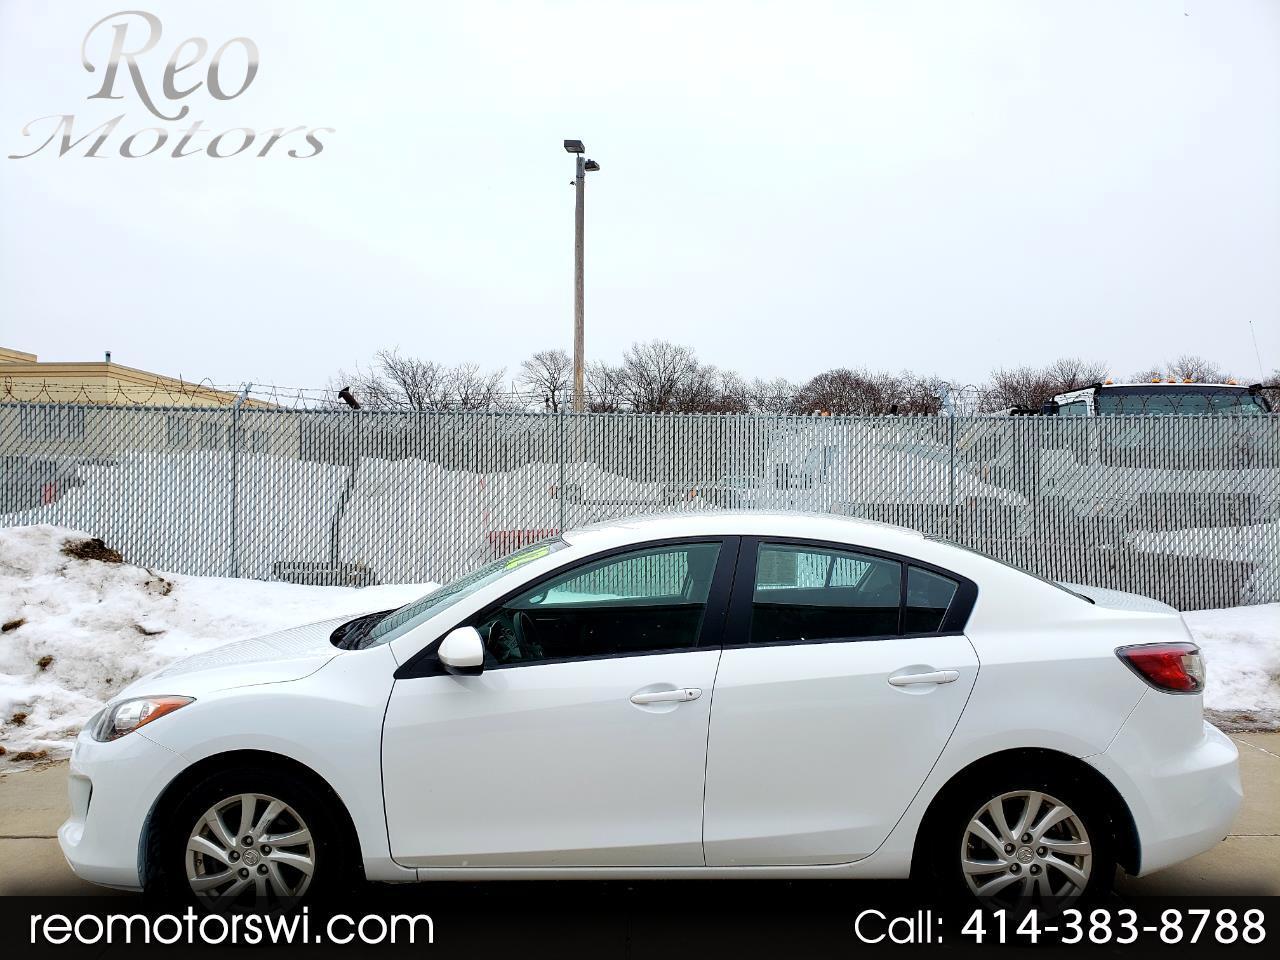 2012 Mazda MAZDA3 4-DOOR